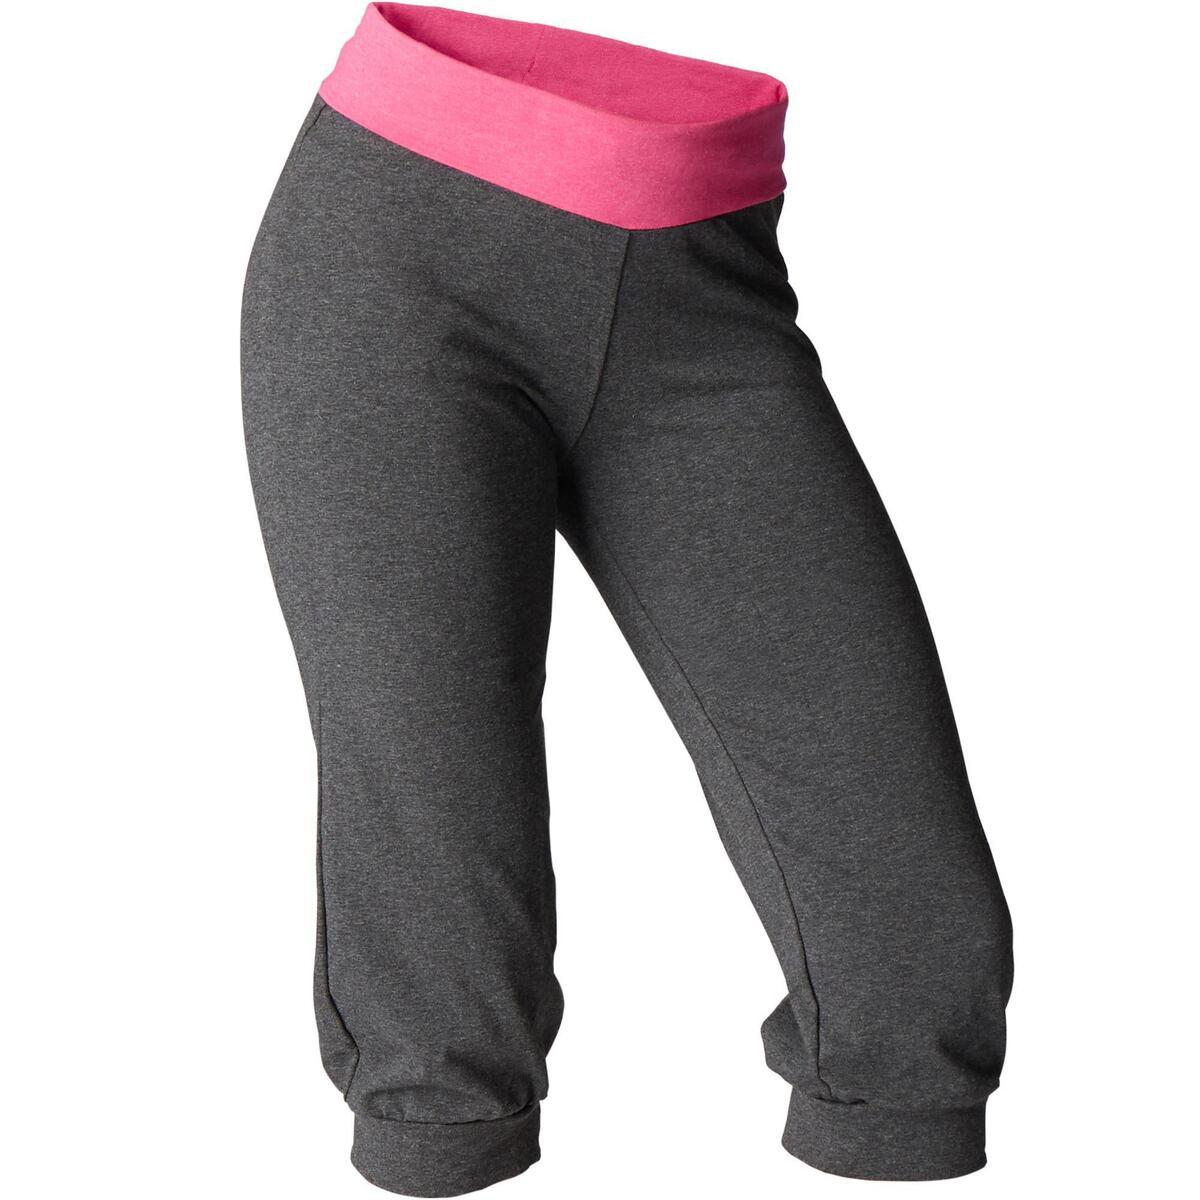 Bild 1 von 3/4-Hose sanftes Yoga Damen grau/rosa